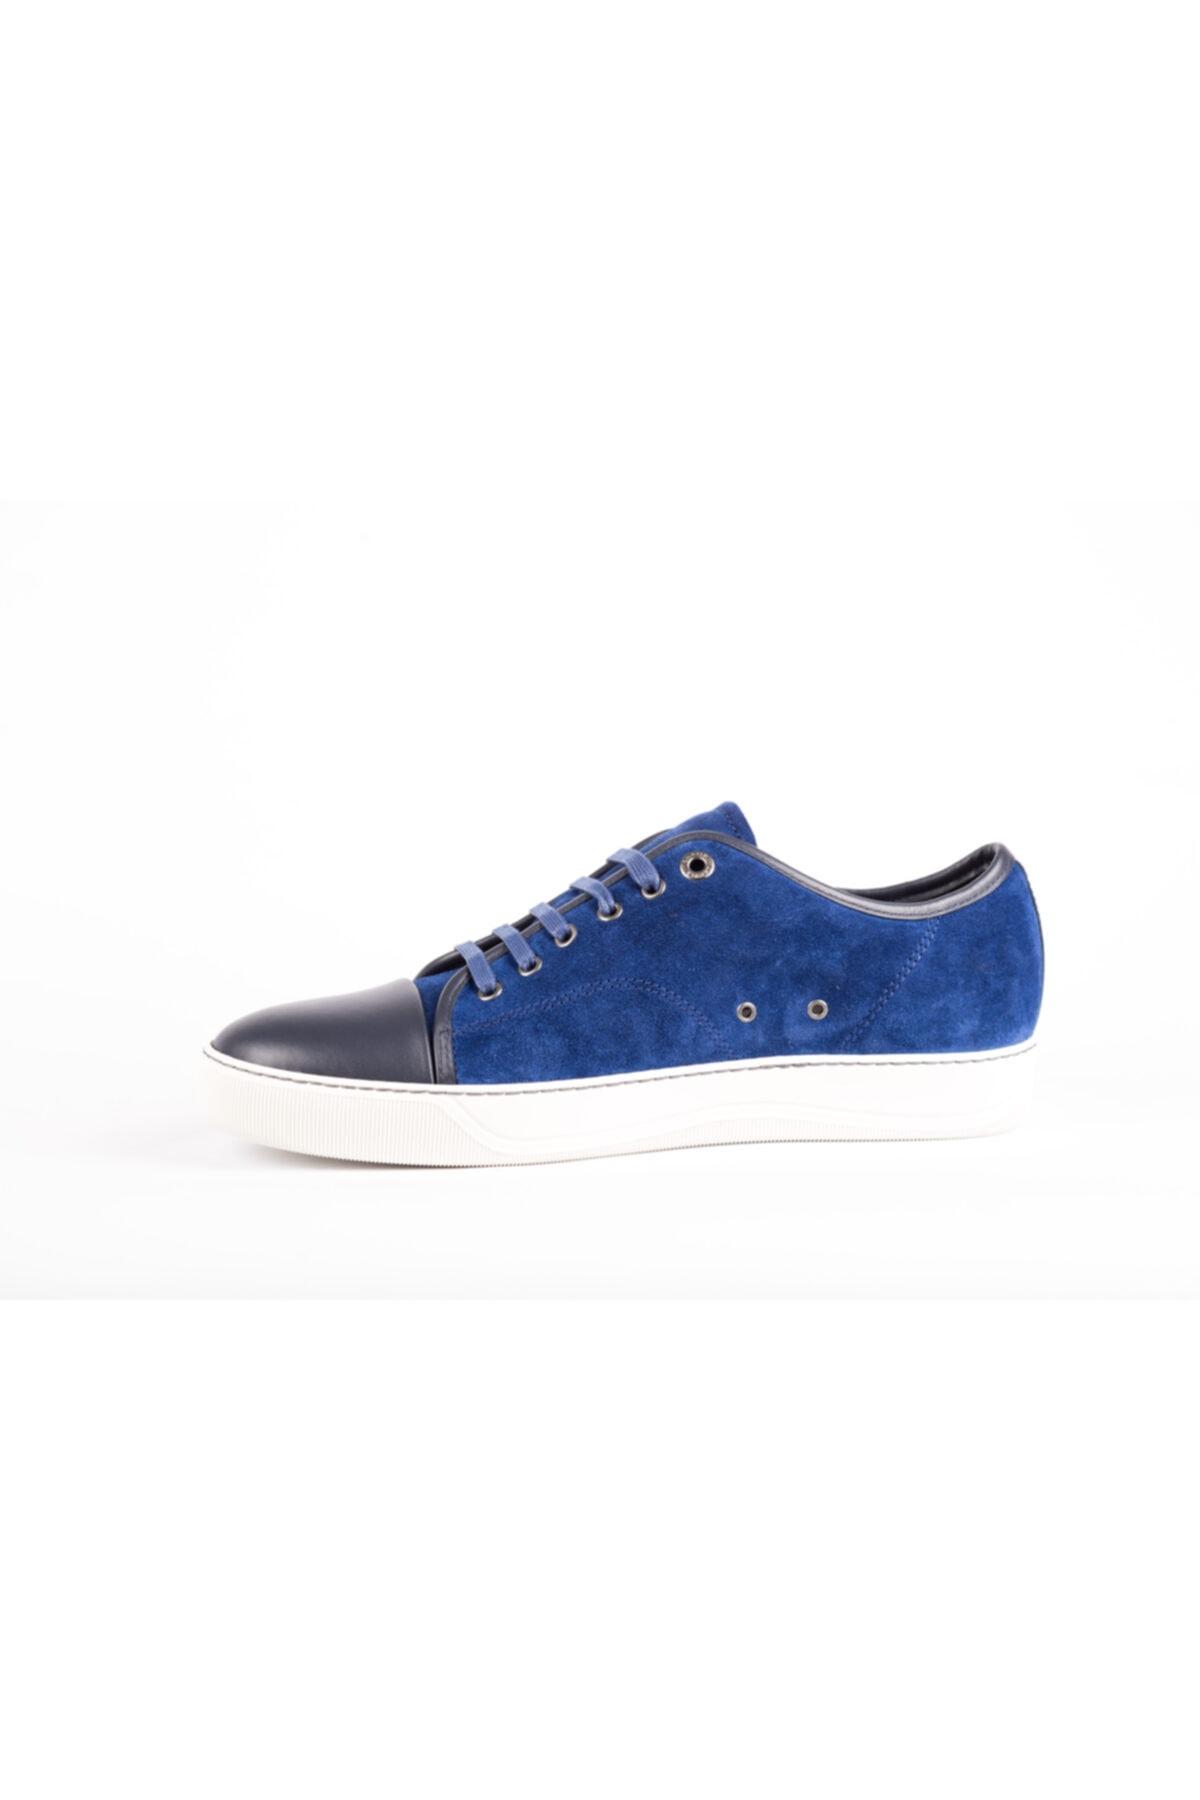 Lanvin Sneakers 2